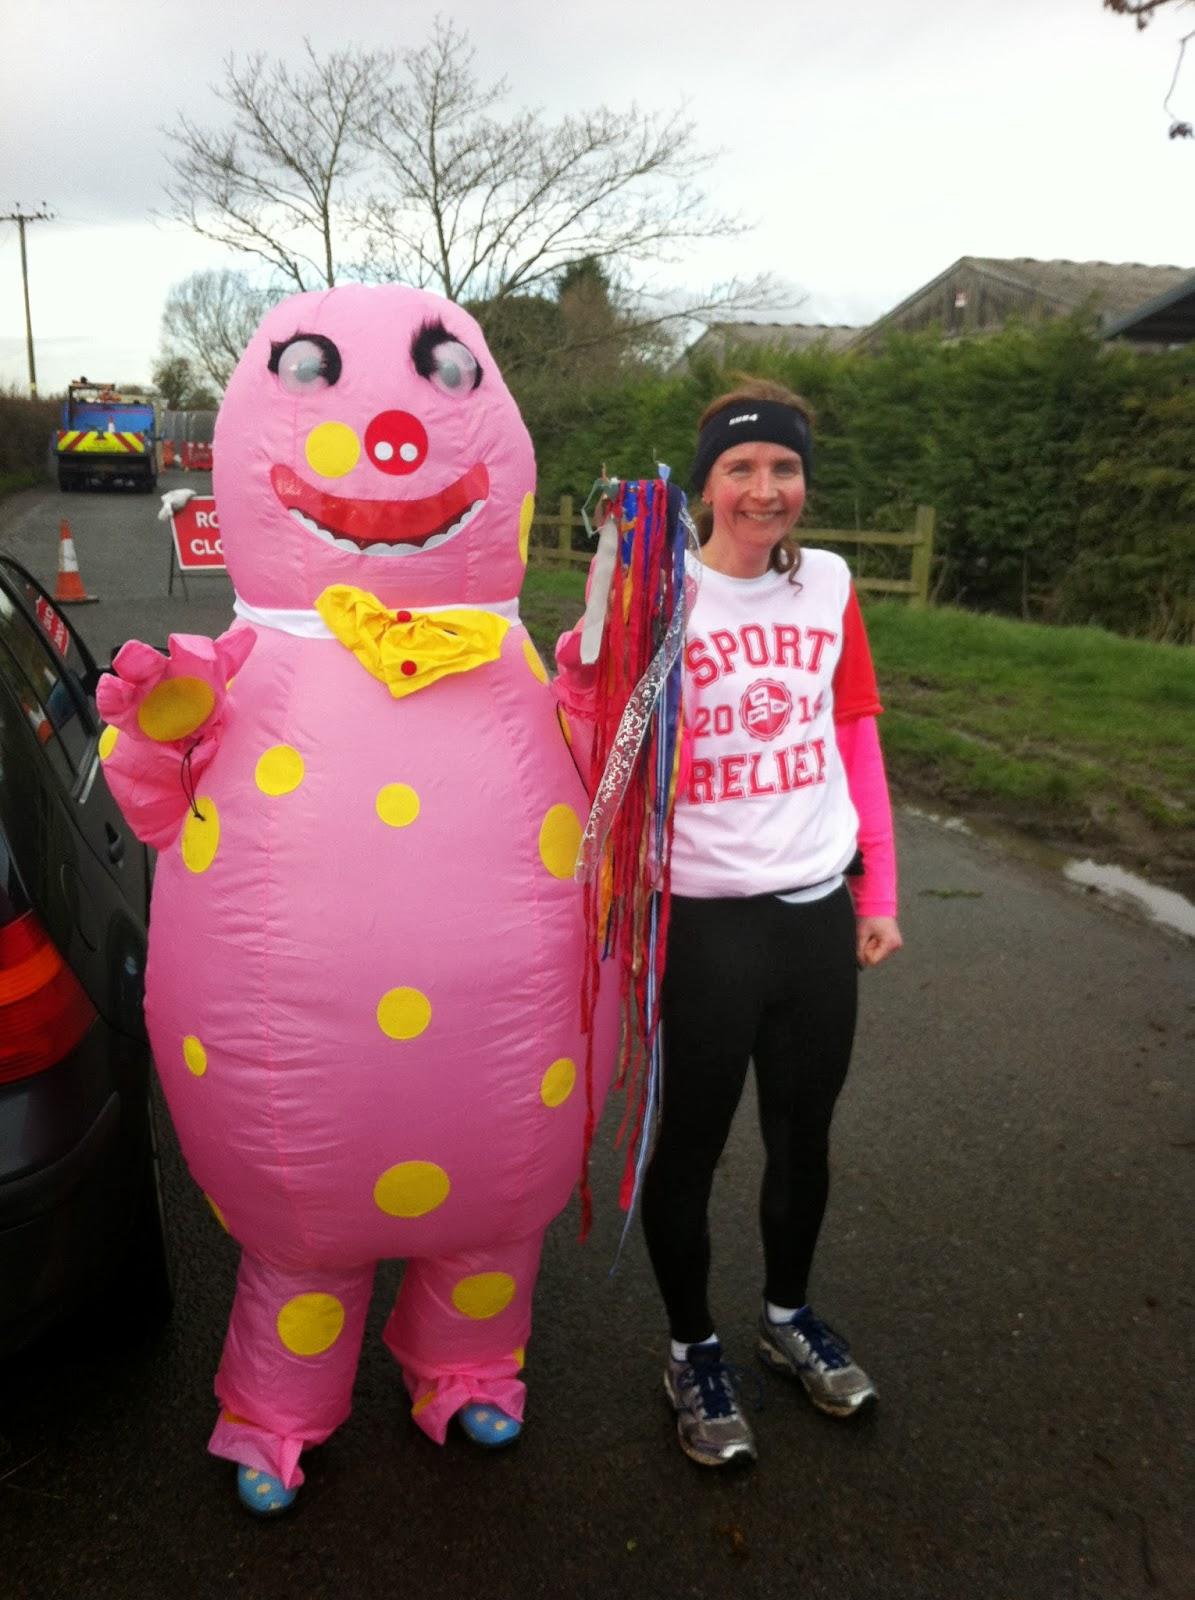 Team-Honk-baton-handover-Pink-Oddy-Mr-Blobby